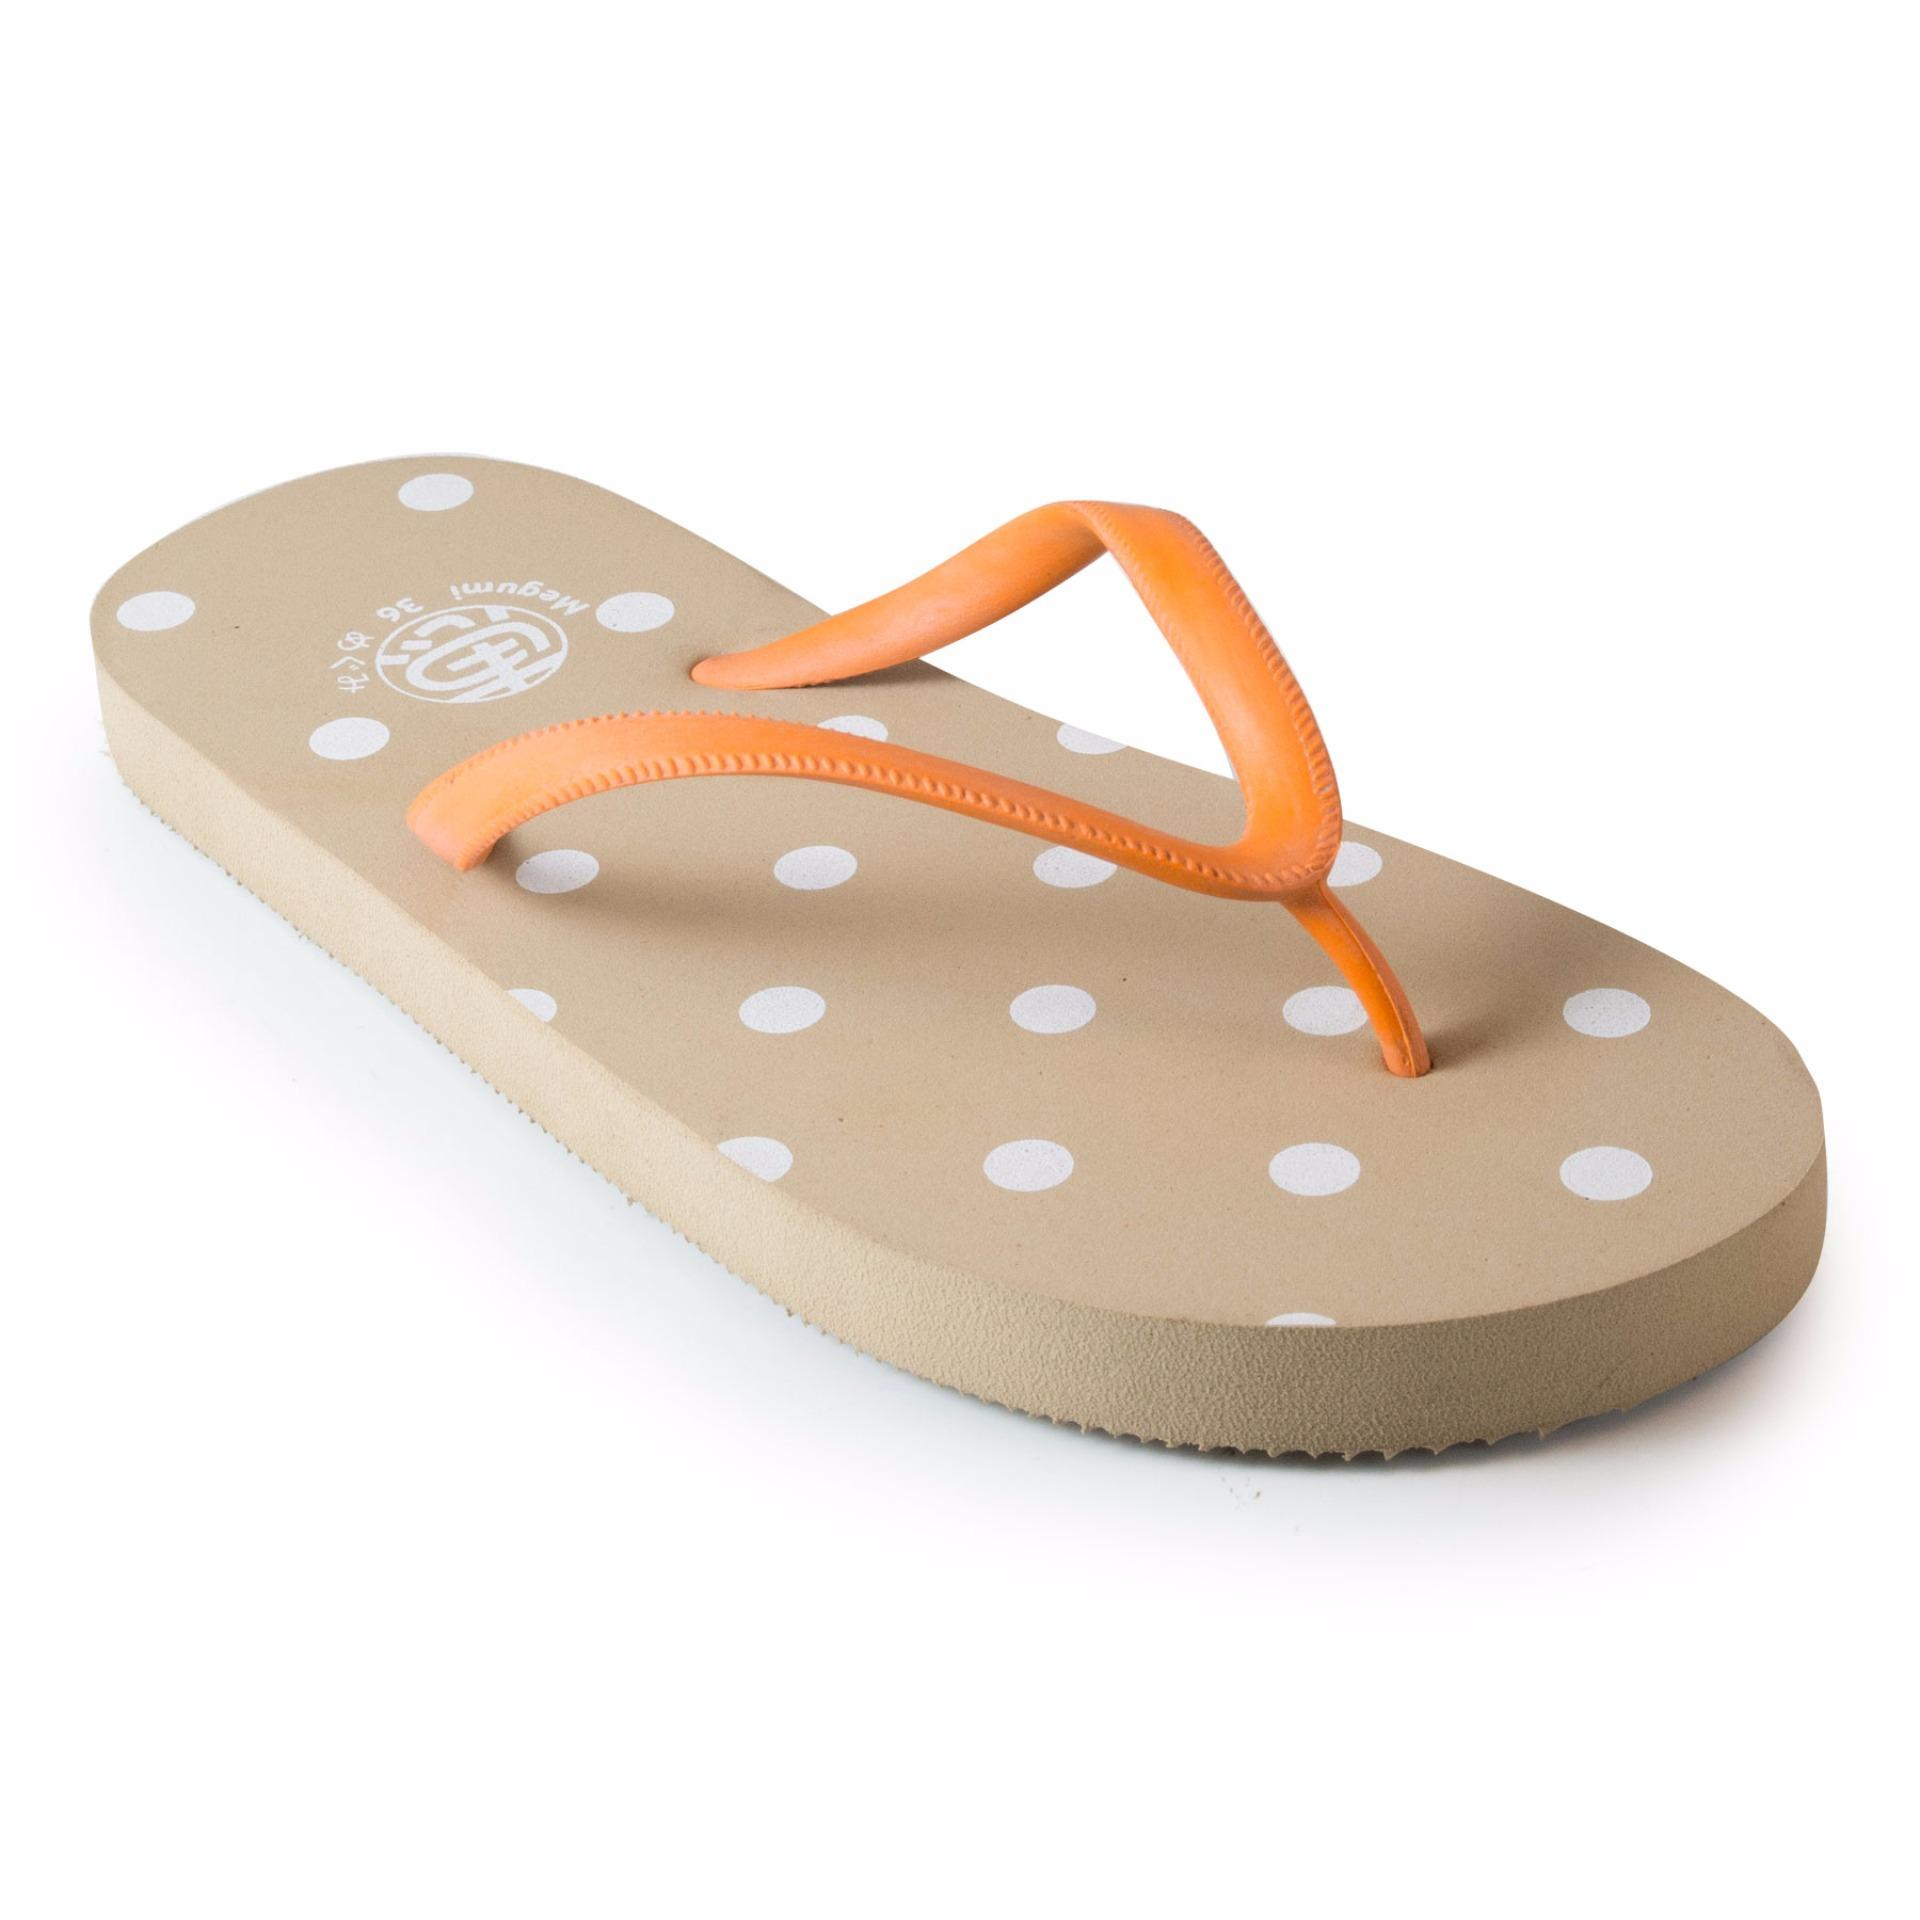 Jual Megumi Polkadot Sandal Jepit Cream Megumi Sandal